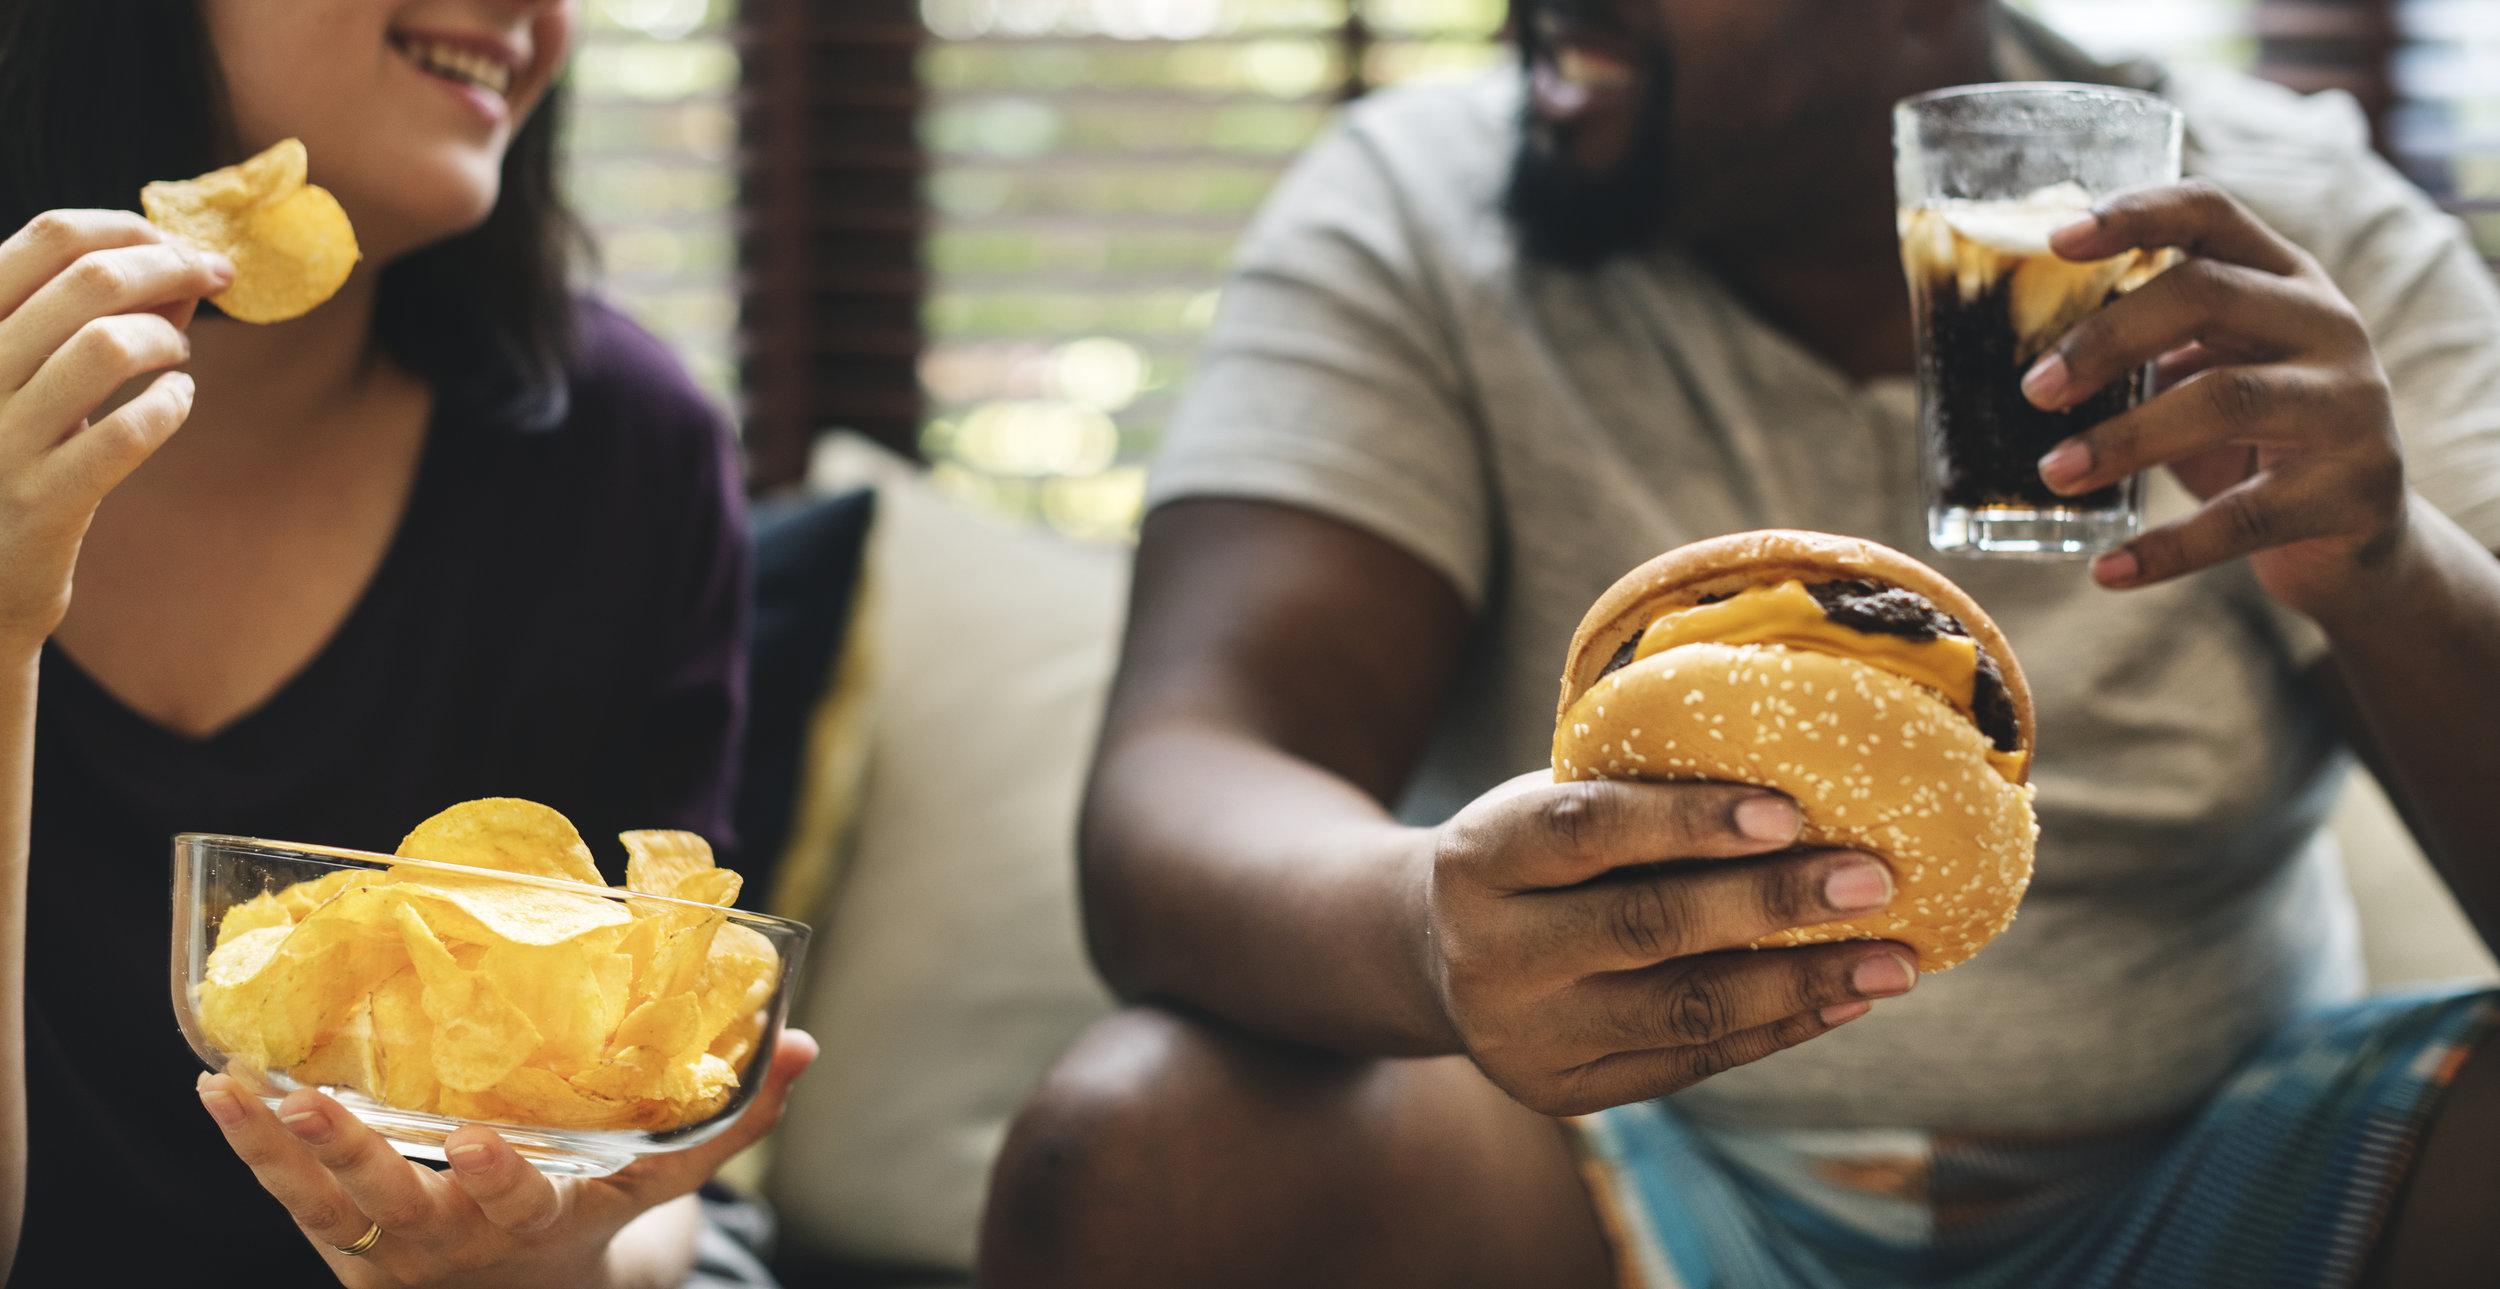 2.1 Psychiatric comorbidity in binge eating -